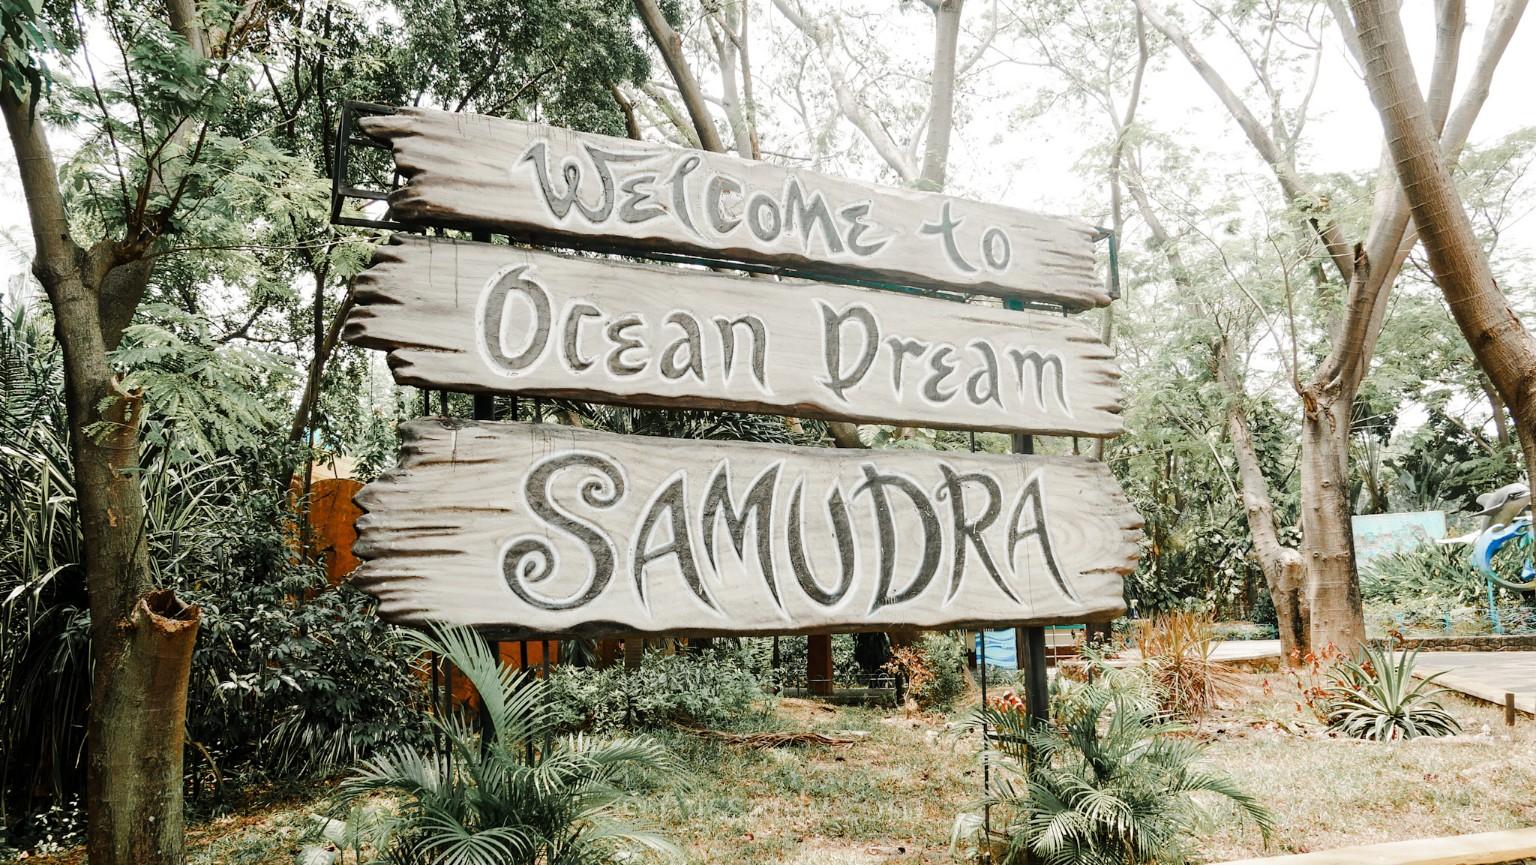 cocean dream samudra ancol 2020